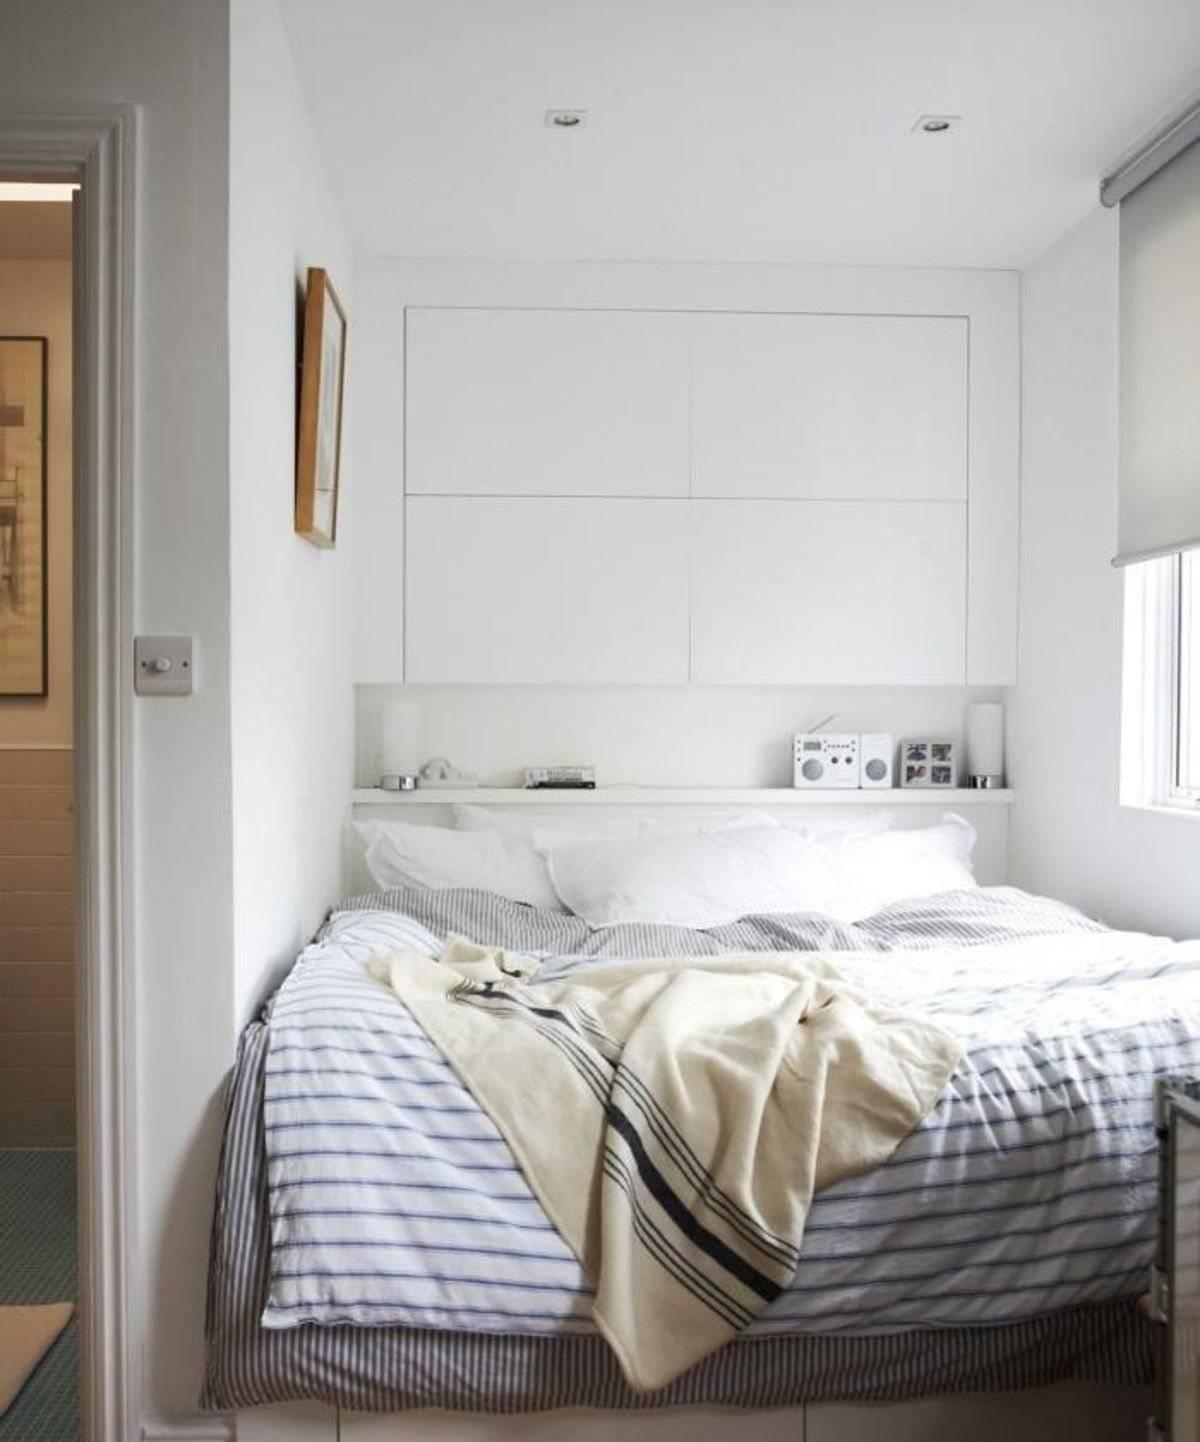 Спальня без окна вентиляция — фото,видео- форум mastergrad